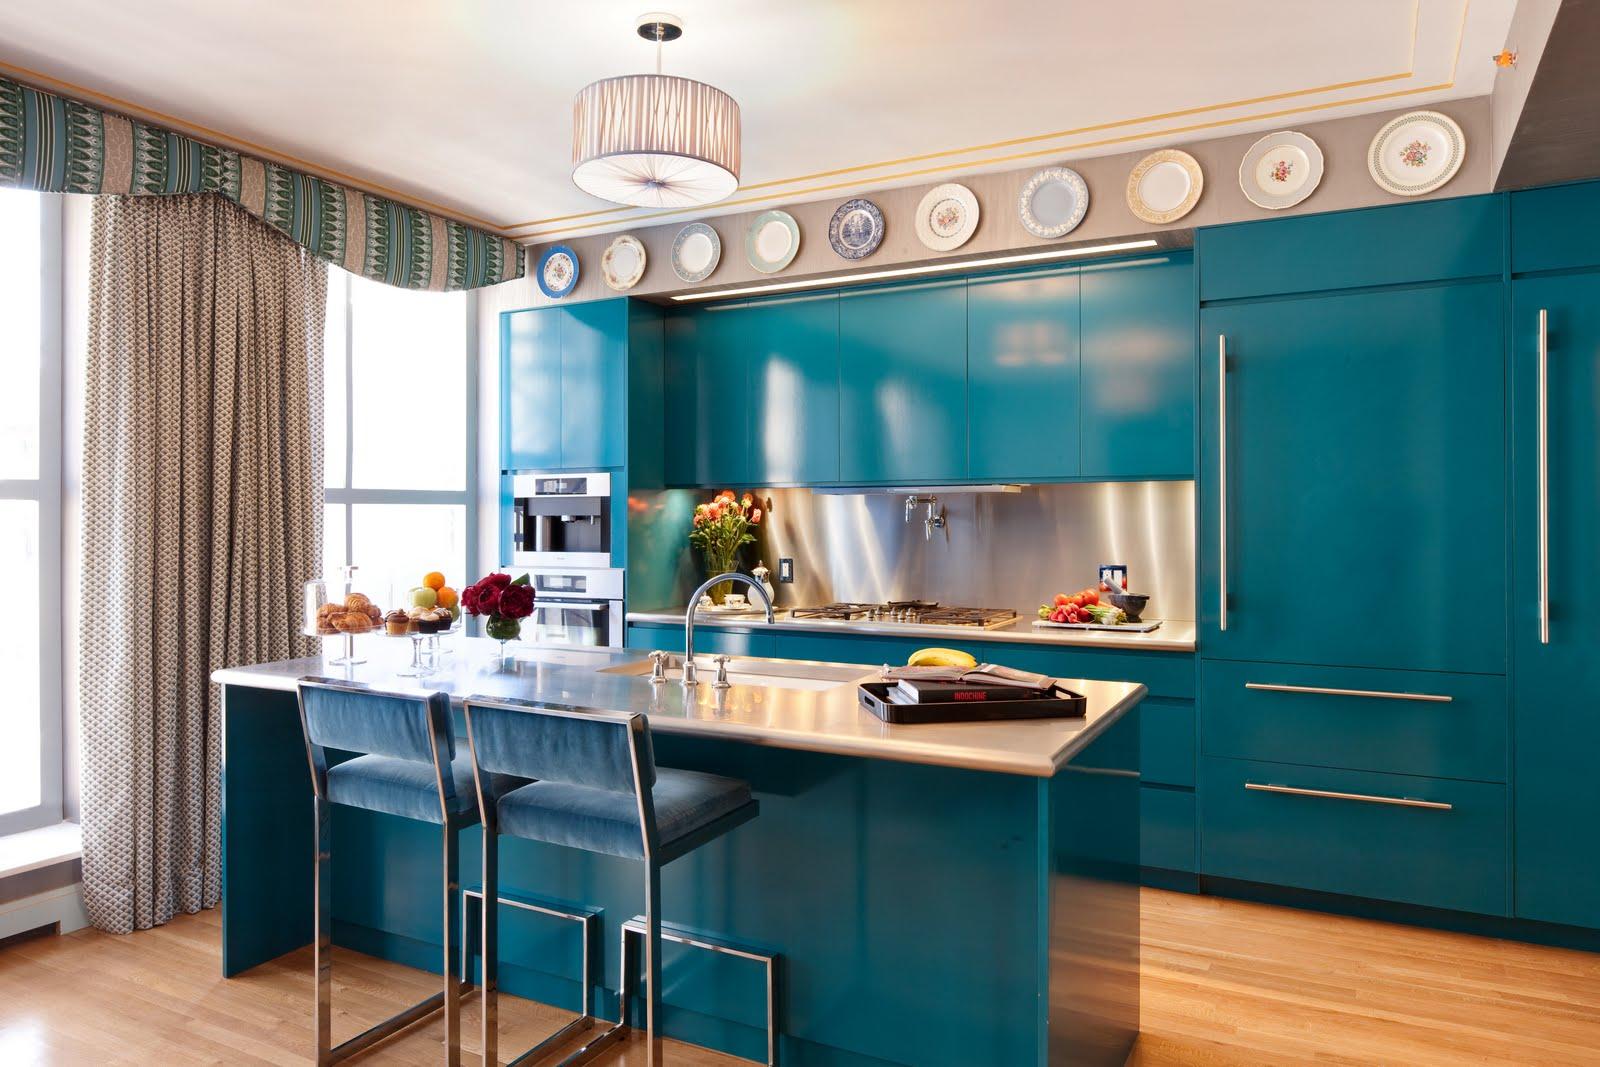 should kitchen cabinets match the hardwood floors cabinet kitchen Home Decorating Trends Homedit